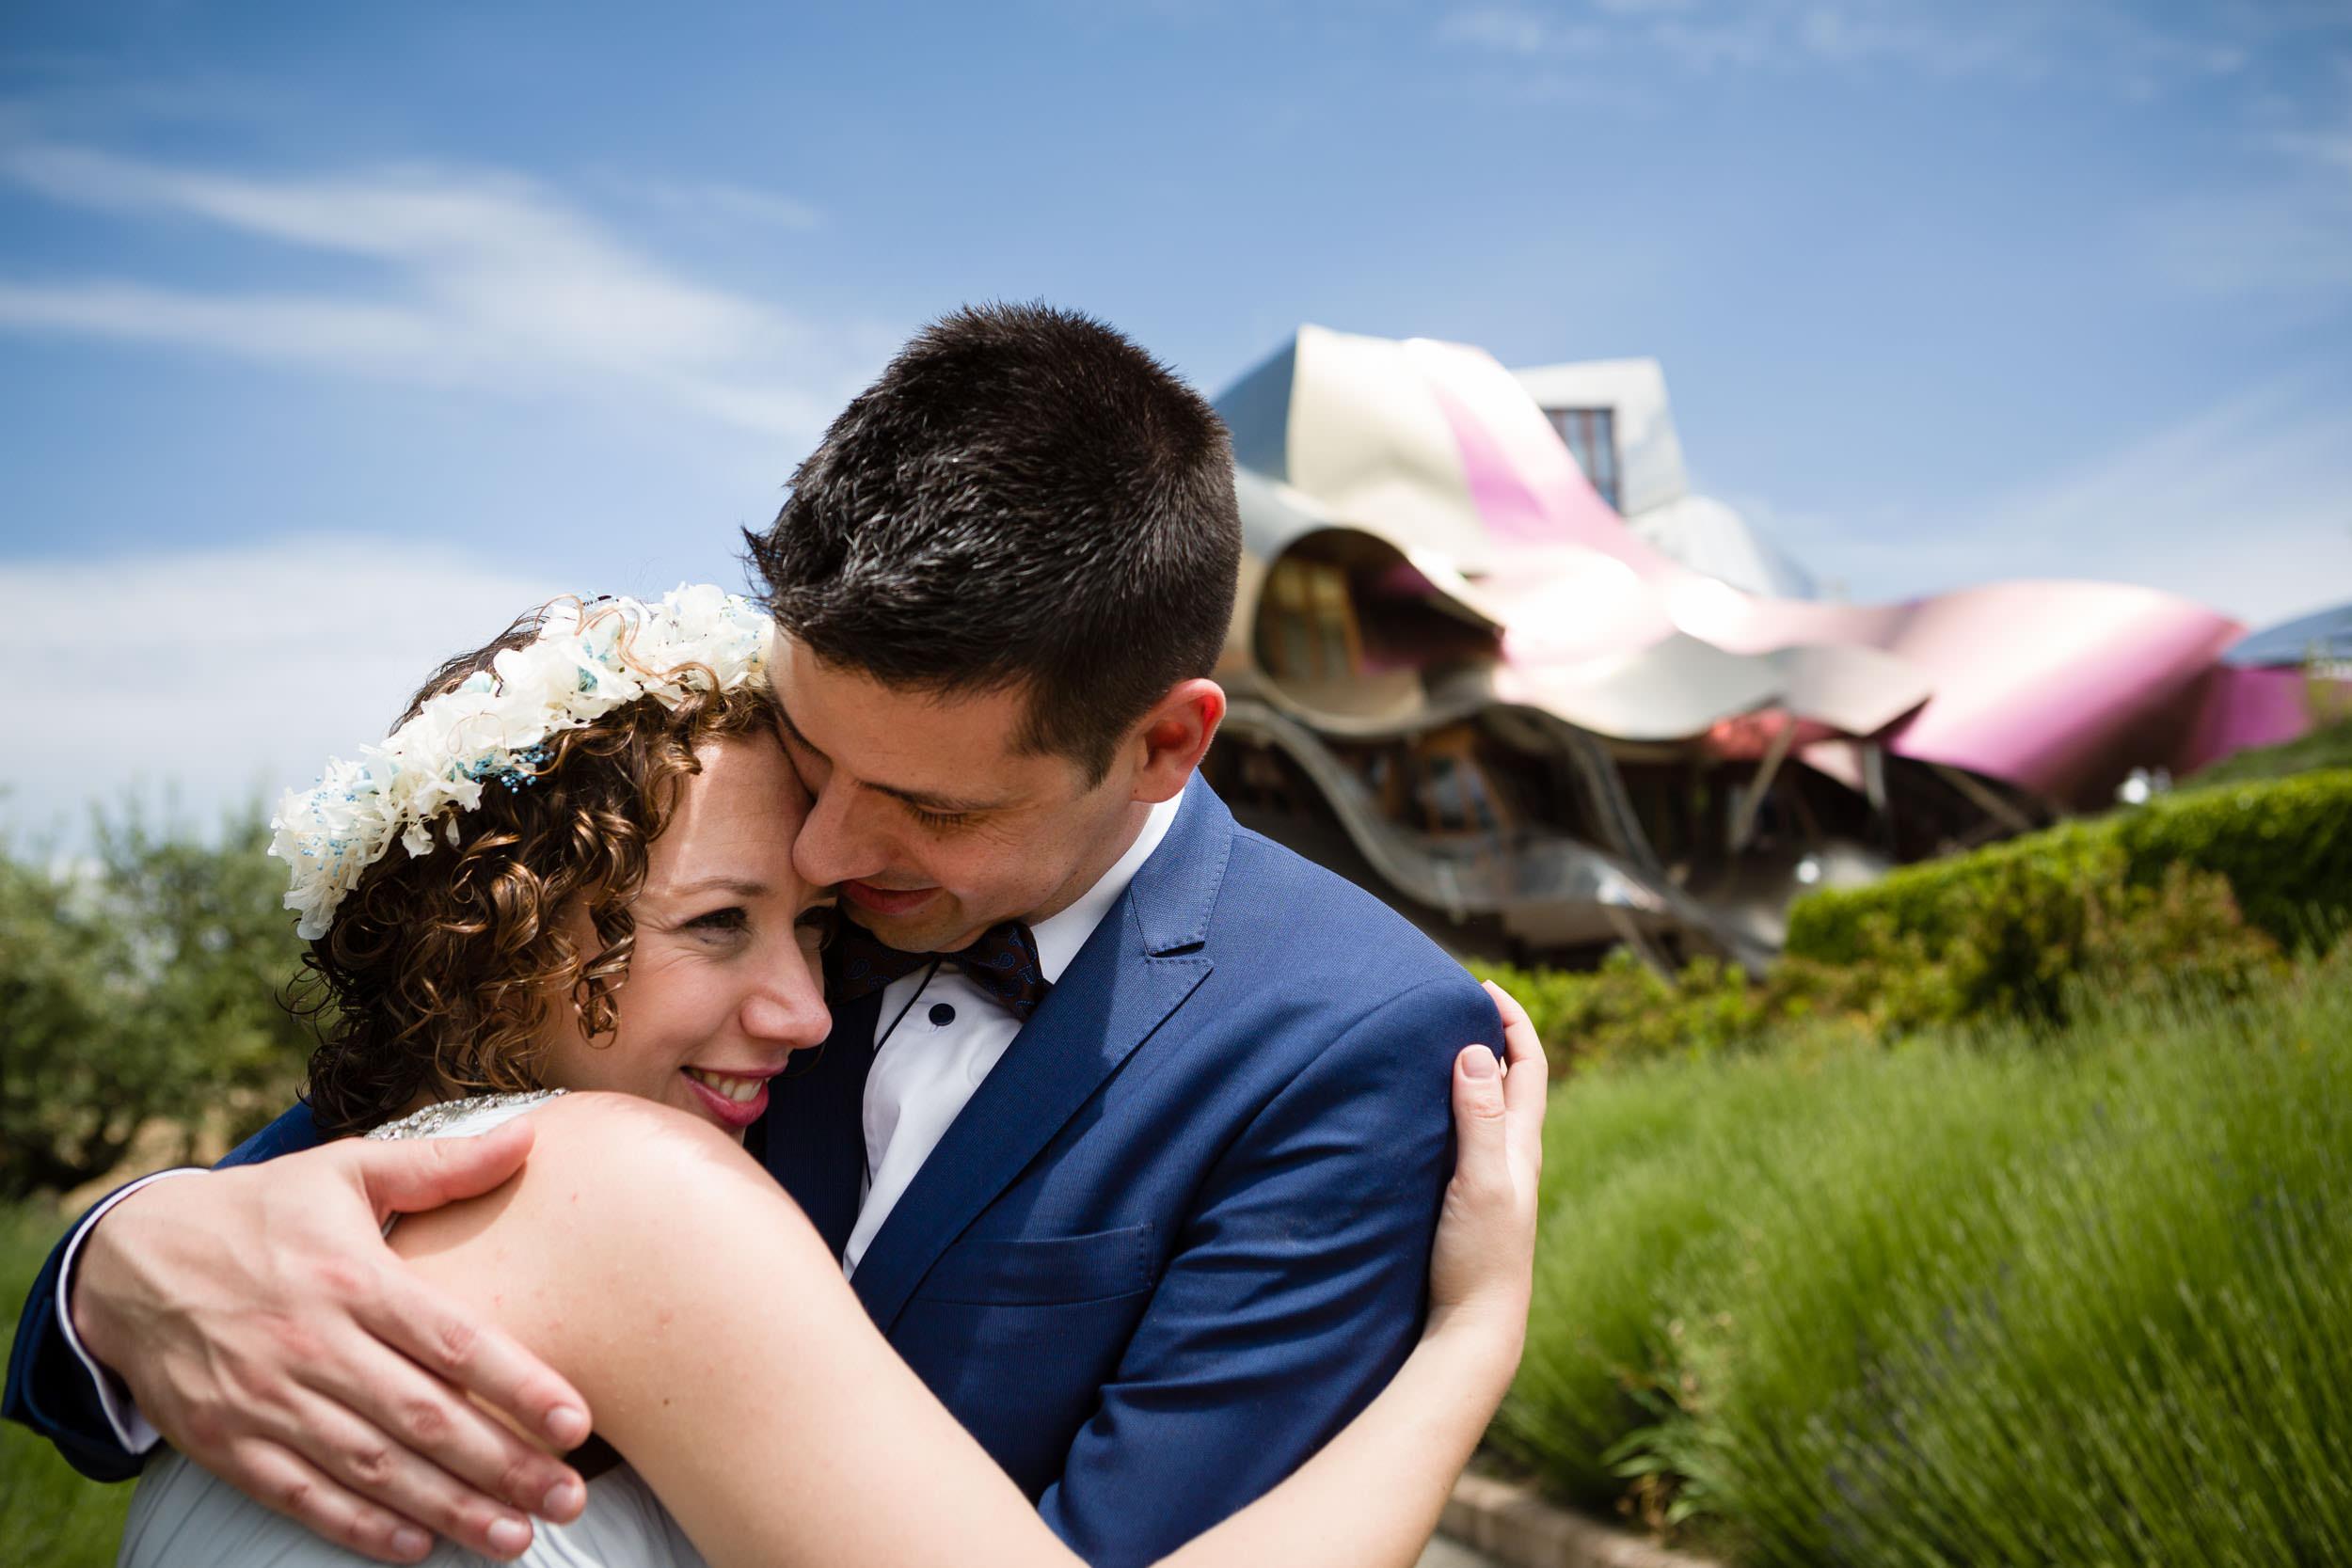 Wedding Photographer La Rioja Basque Country Spain - James Sturcke - sturcke.org_046.jpg